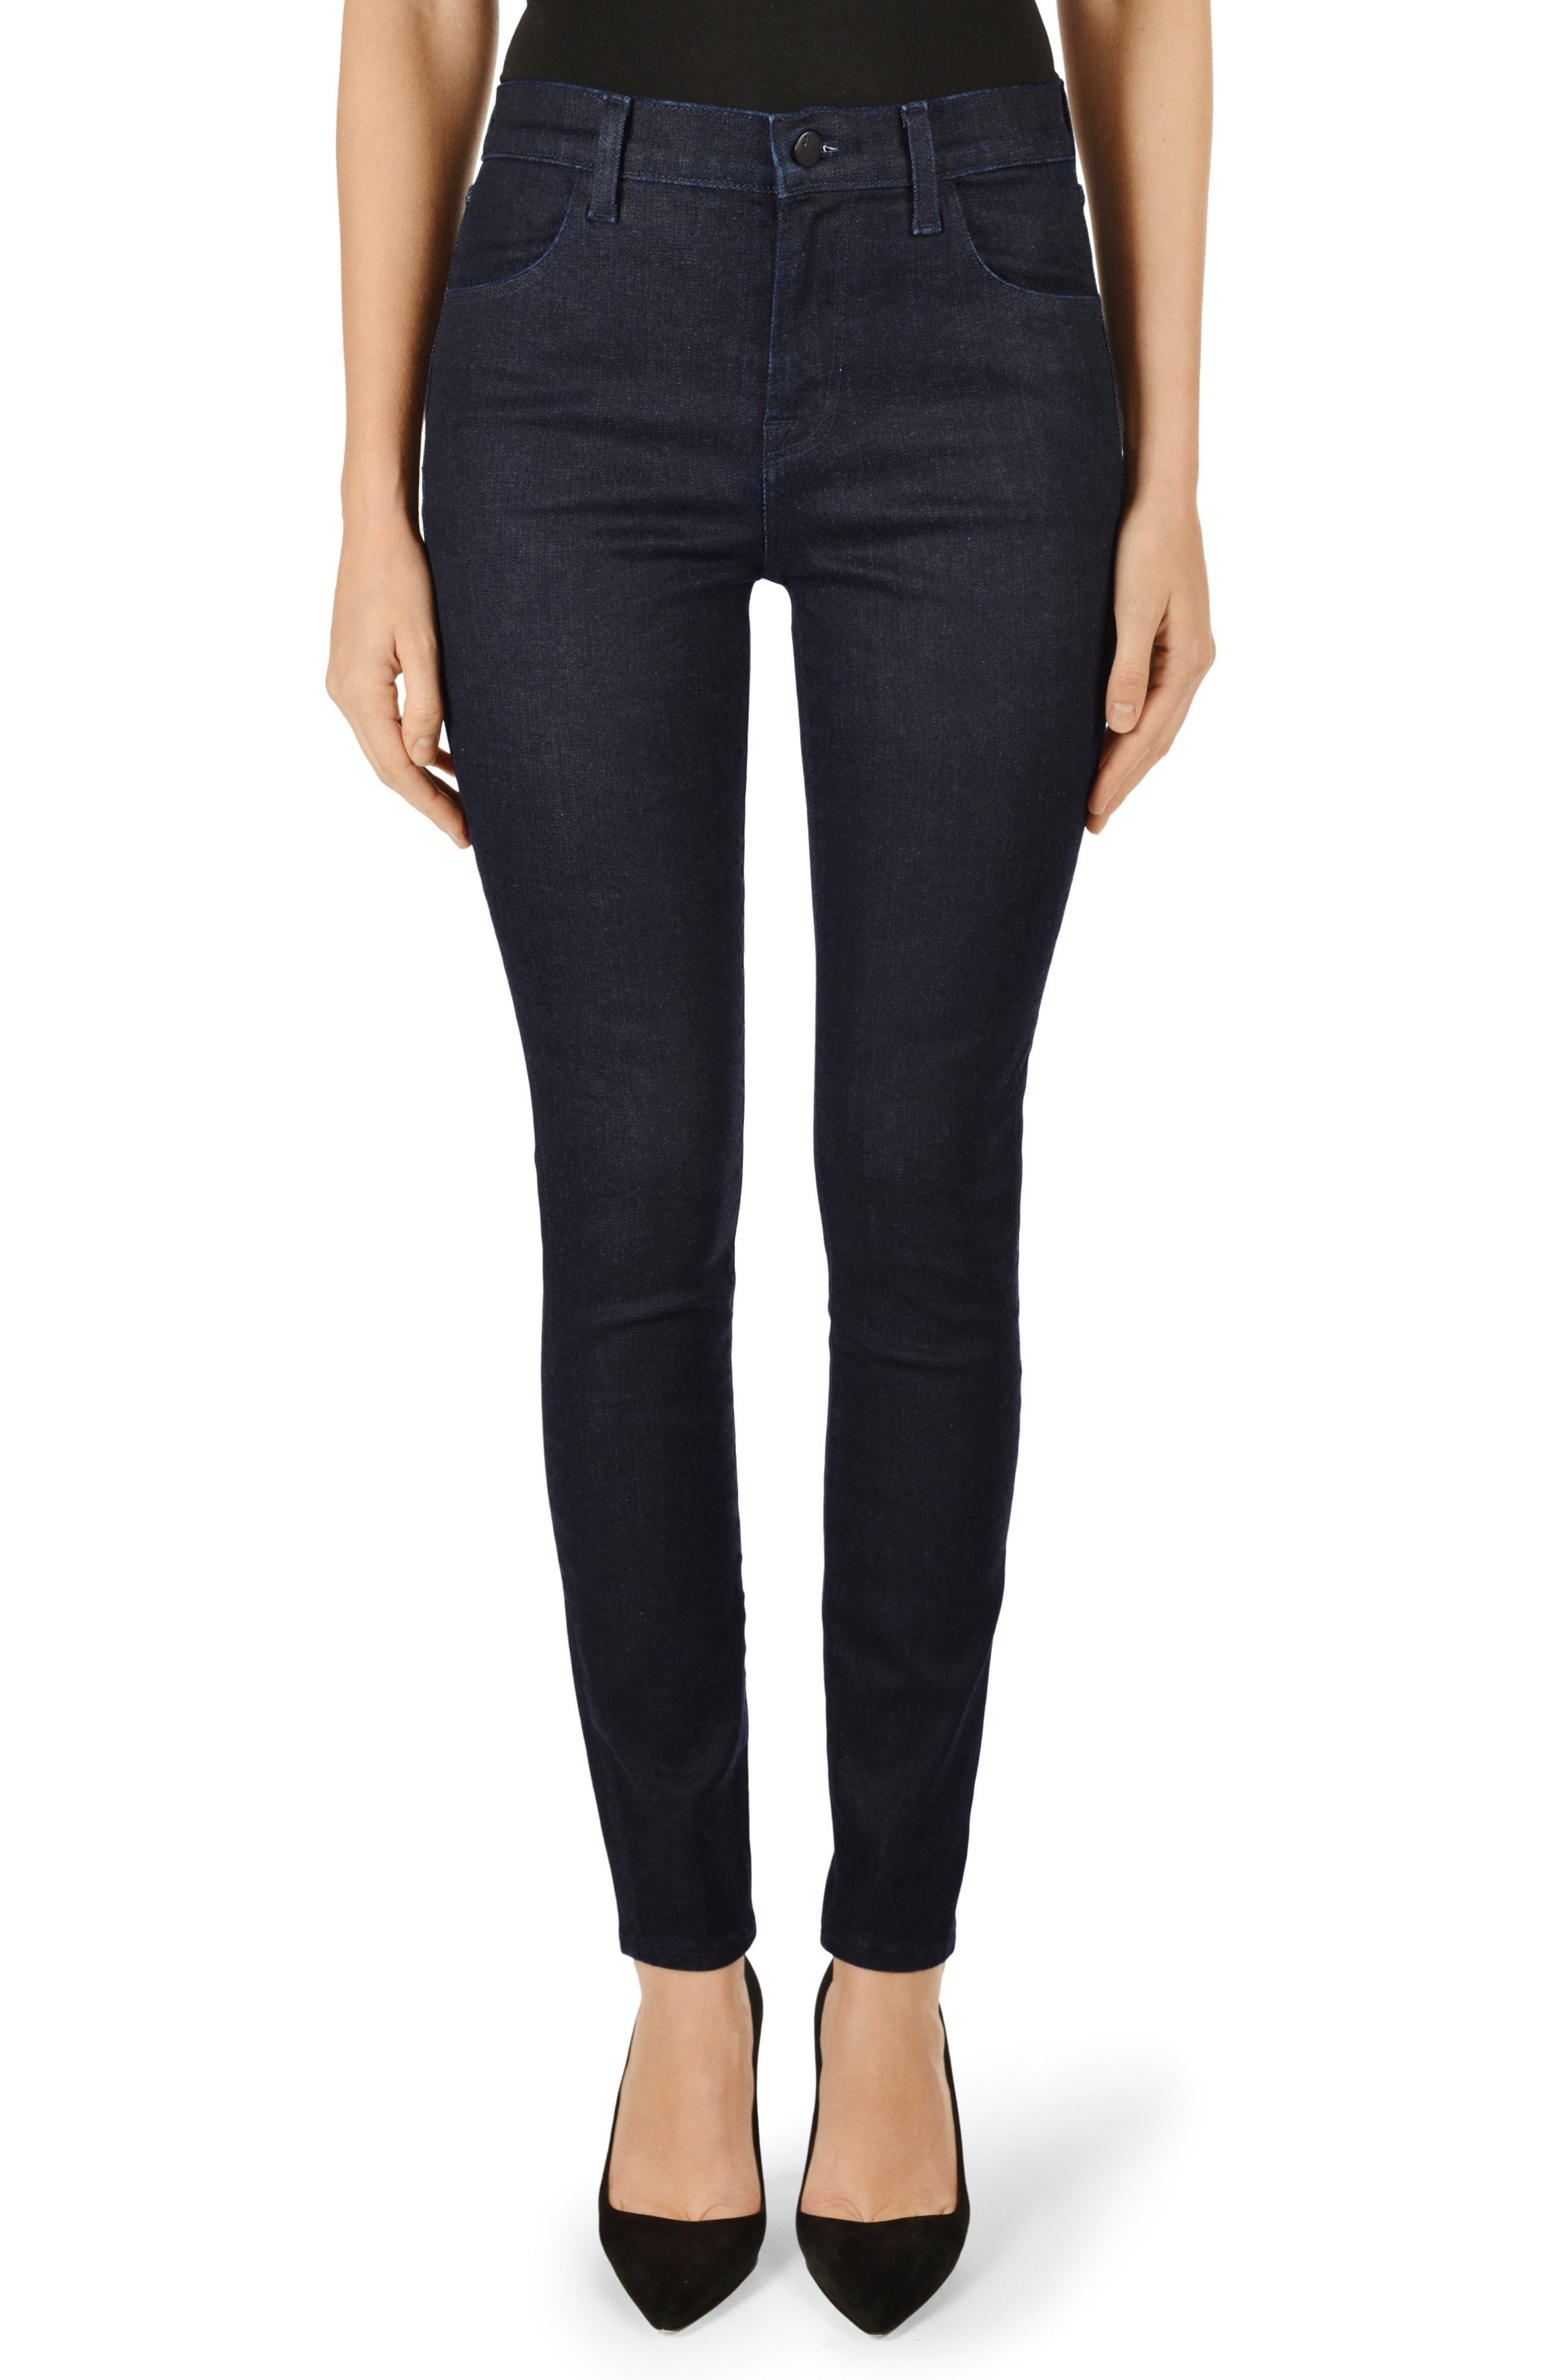 Maria High-Rise Skinny Jeans - Black Size 26